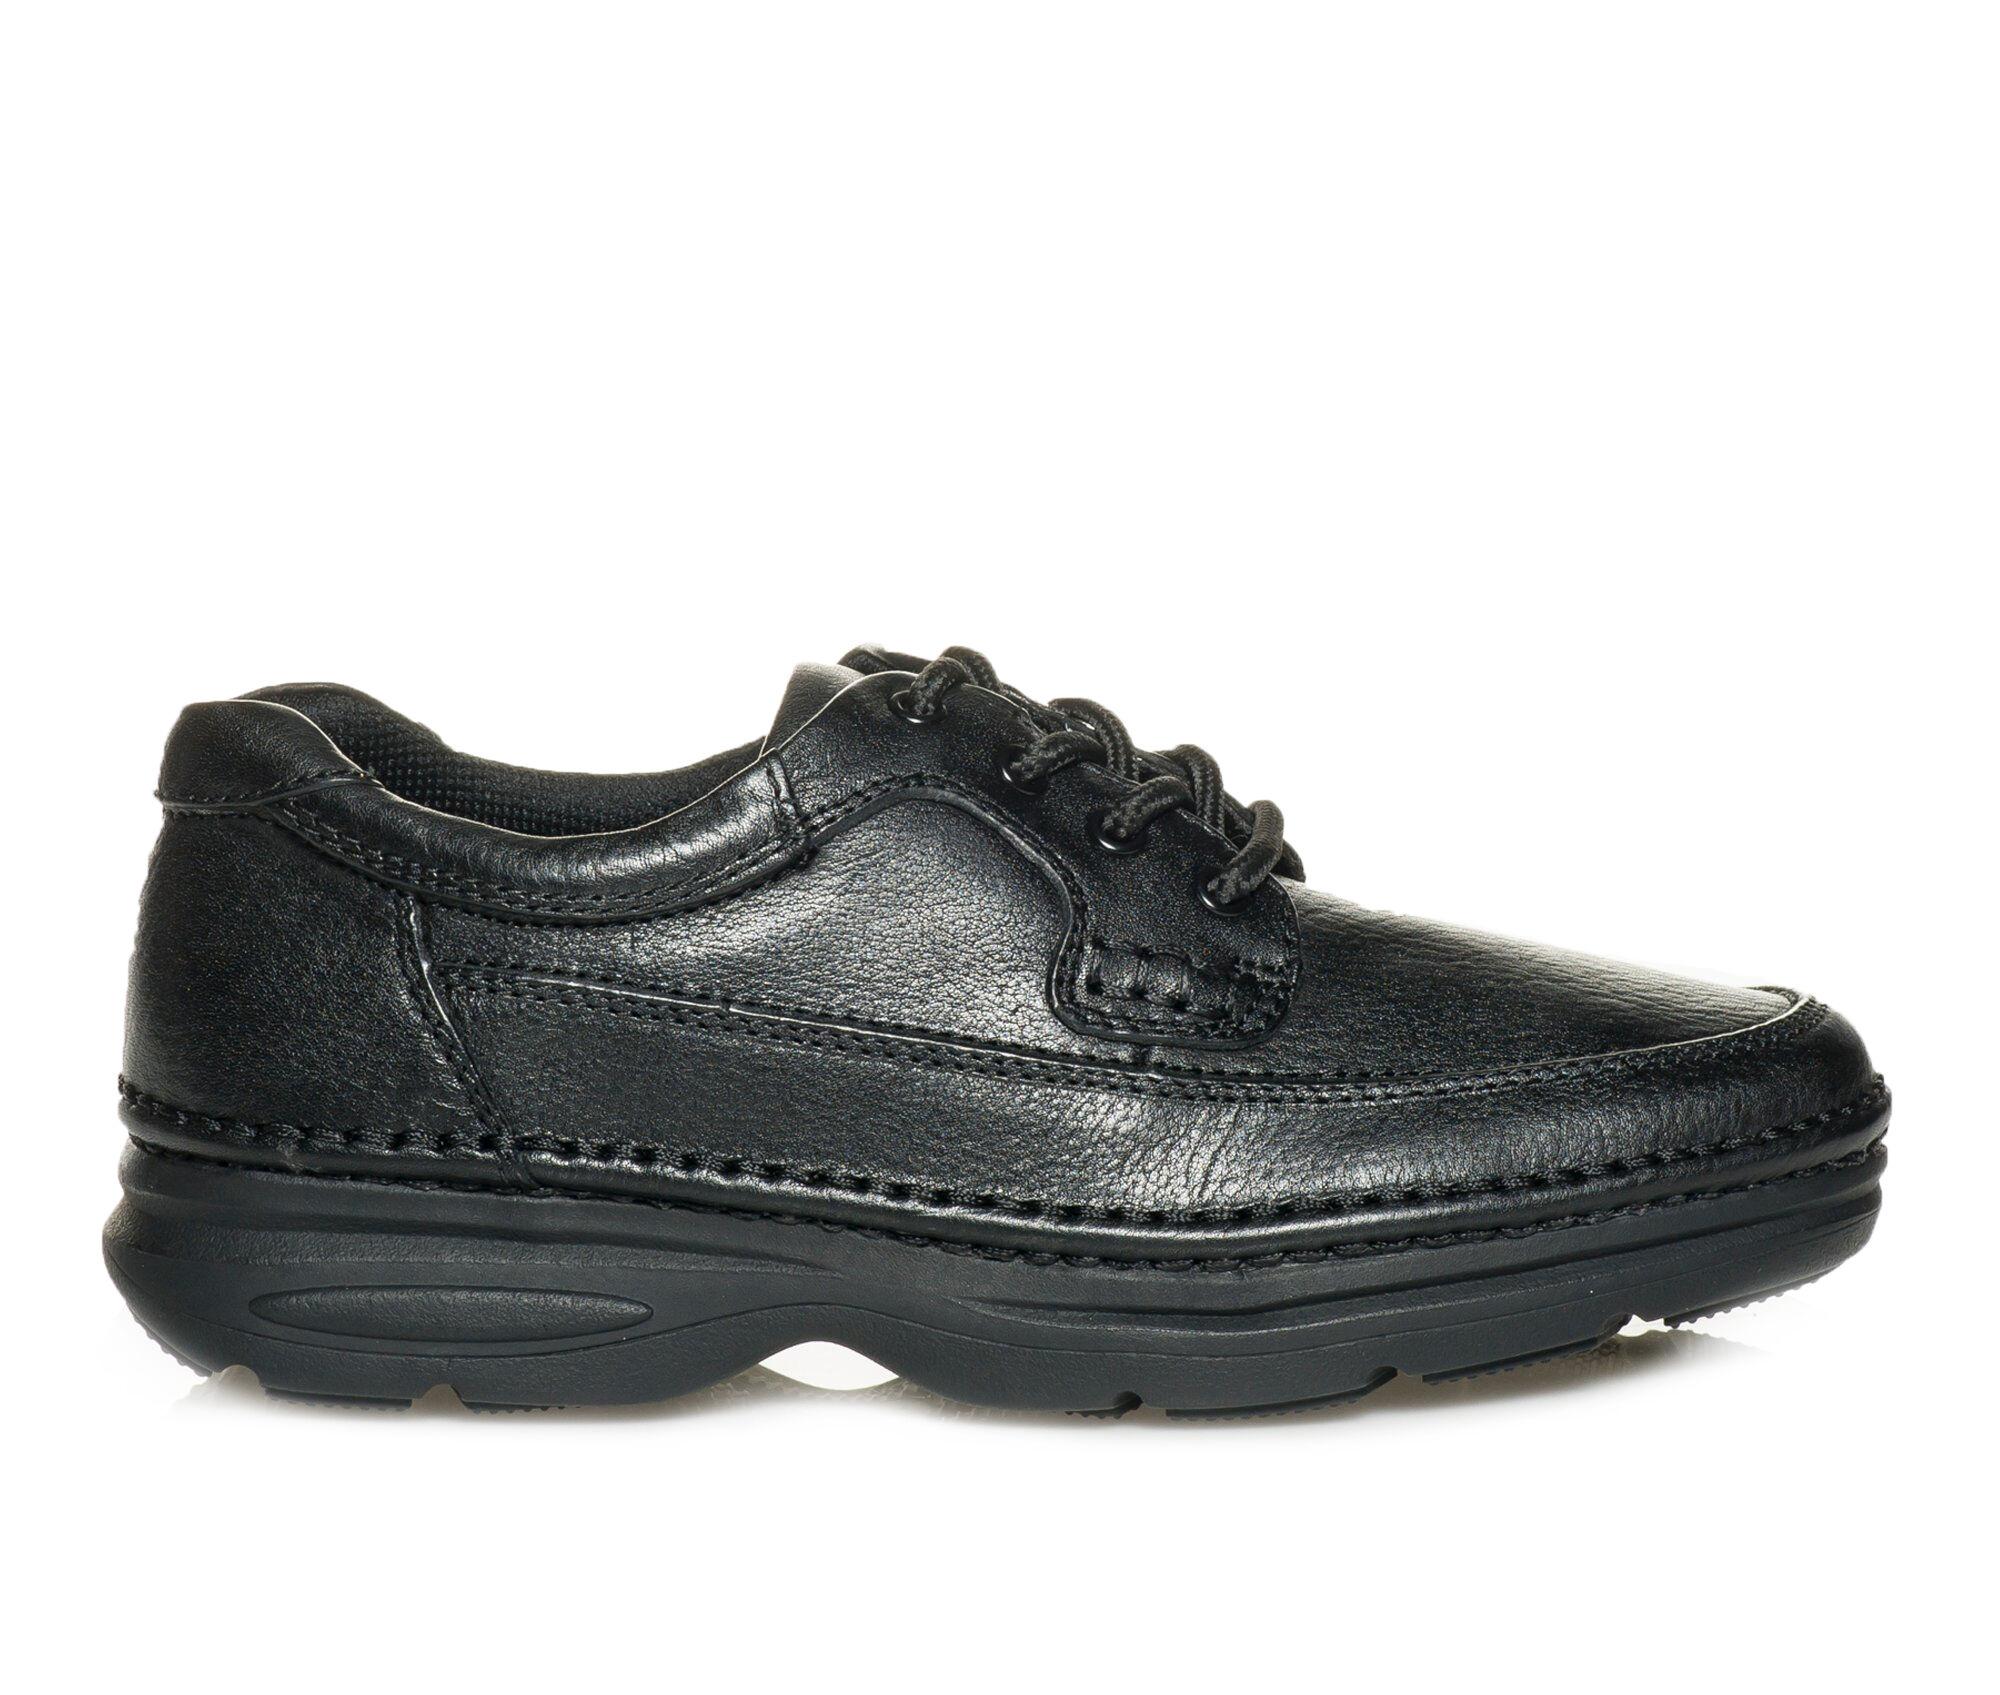 outlet manchester great sale for sale top quality Men's Nunn Bush Cameron Casual Shoes loHIG